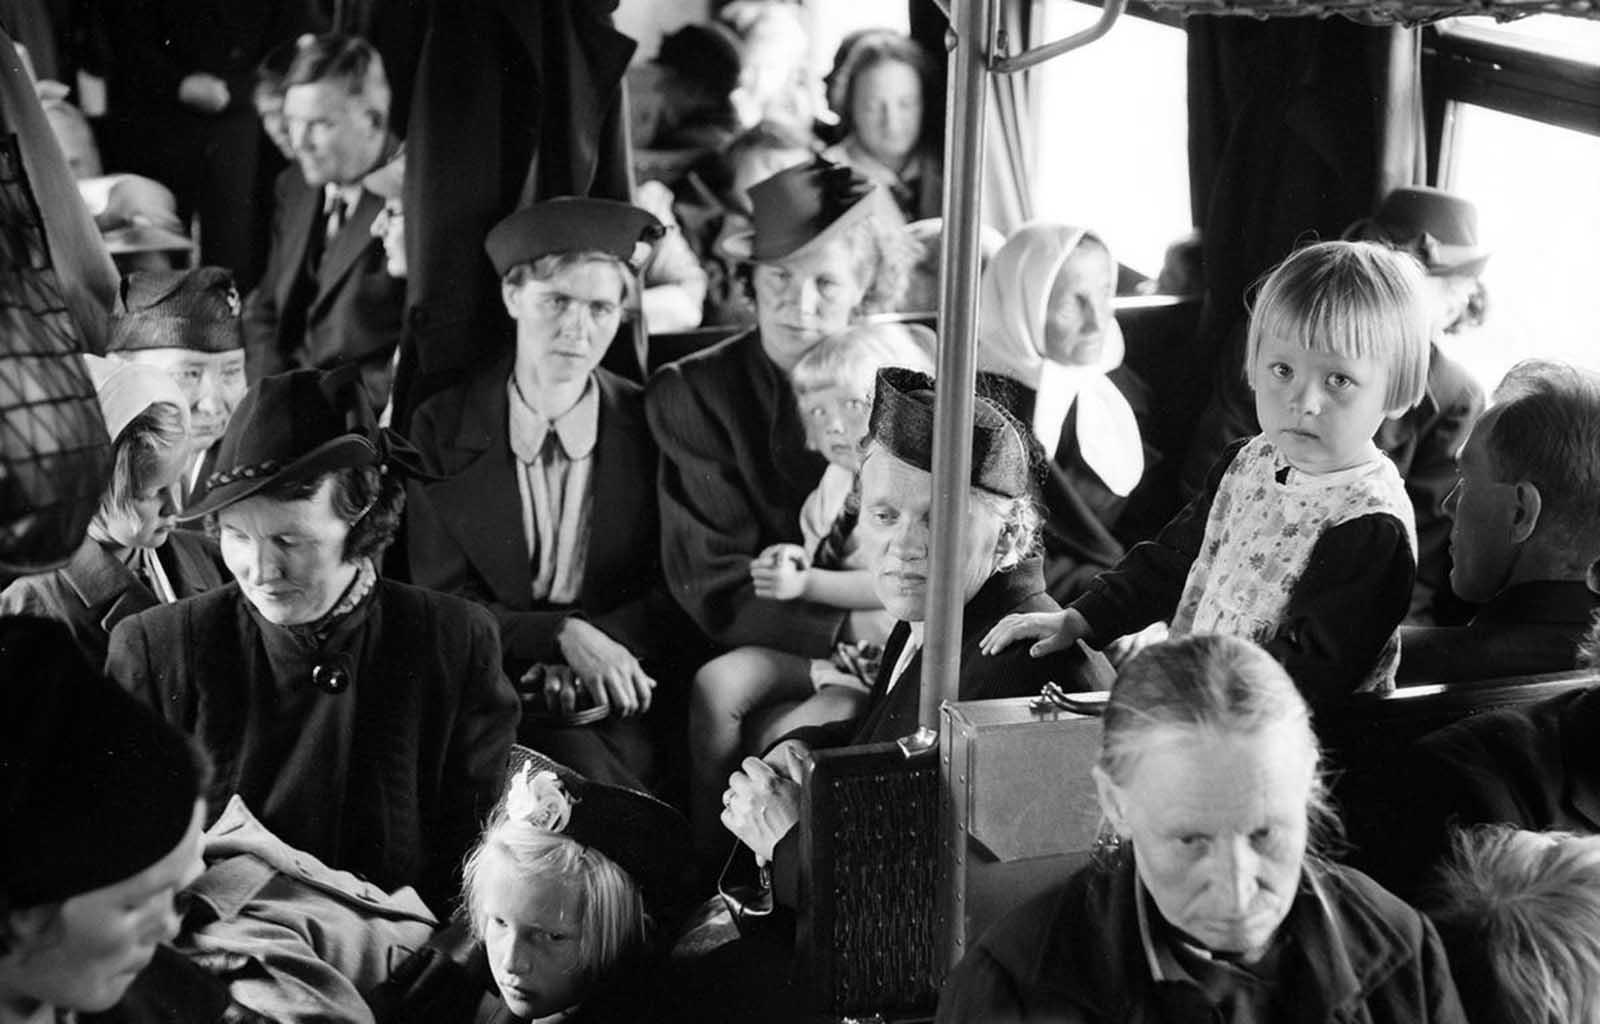 L'incroyable histoire de la Finlande dans la seconde Guerre Mondiale, 1939-1945